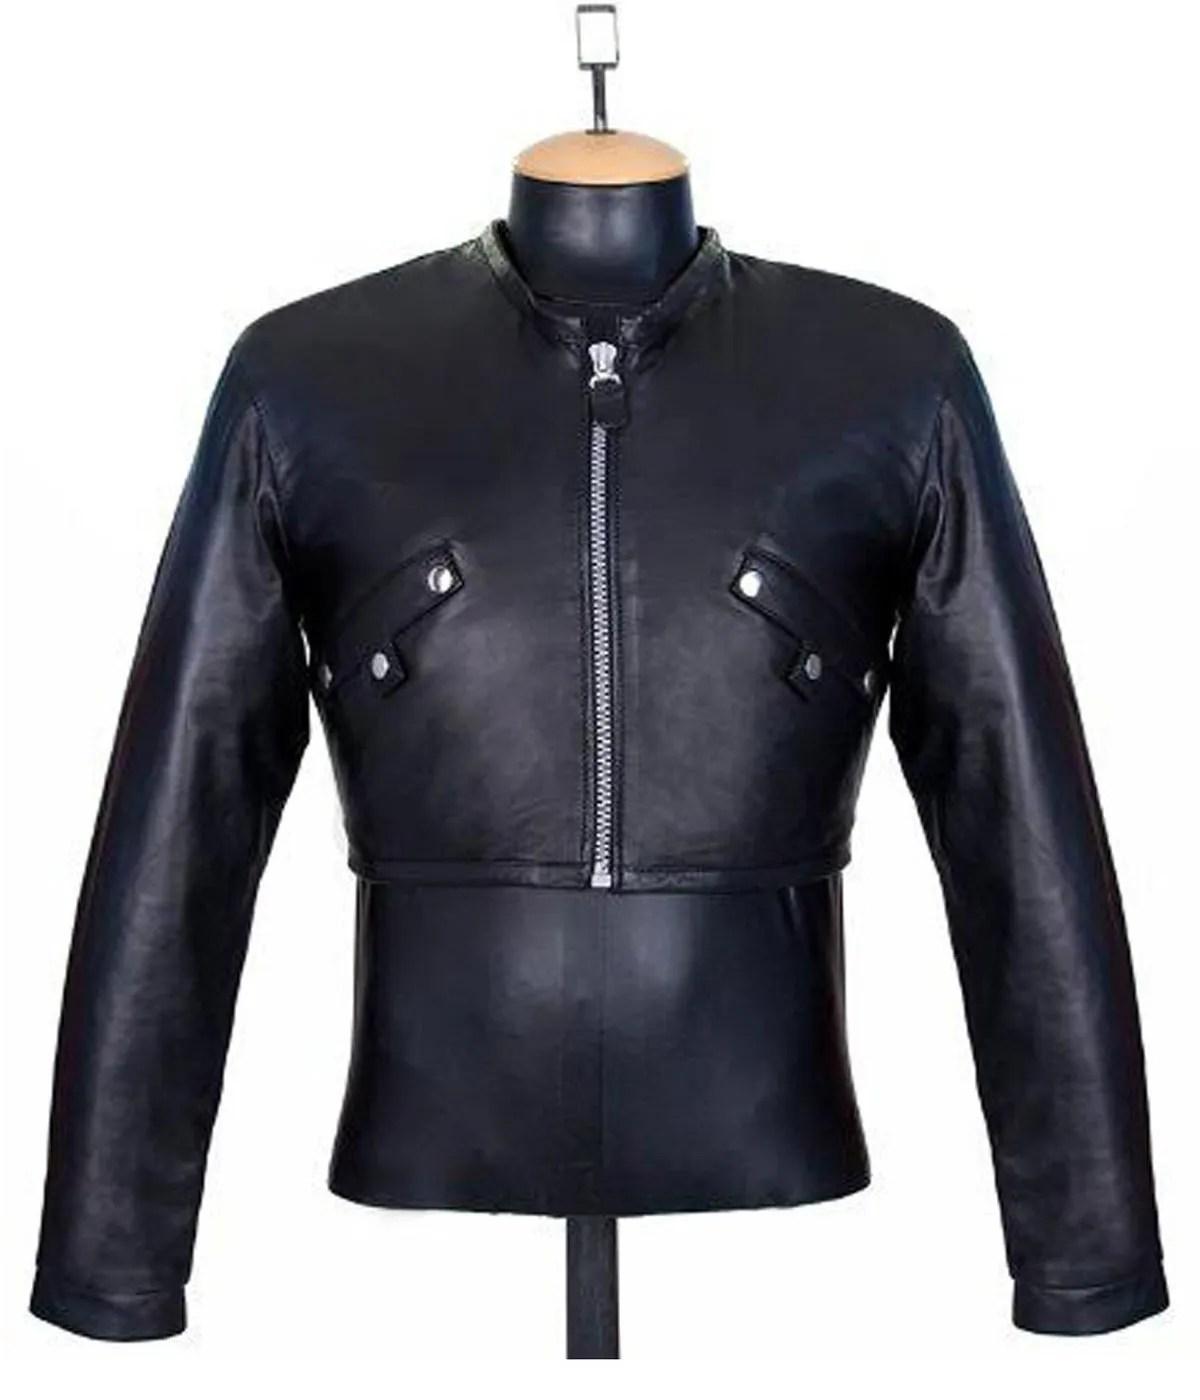 final-fantasy-squall-leonhart-ff8-jacket